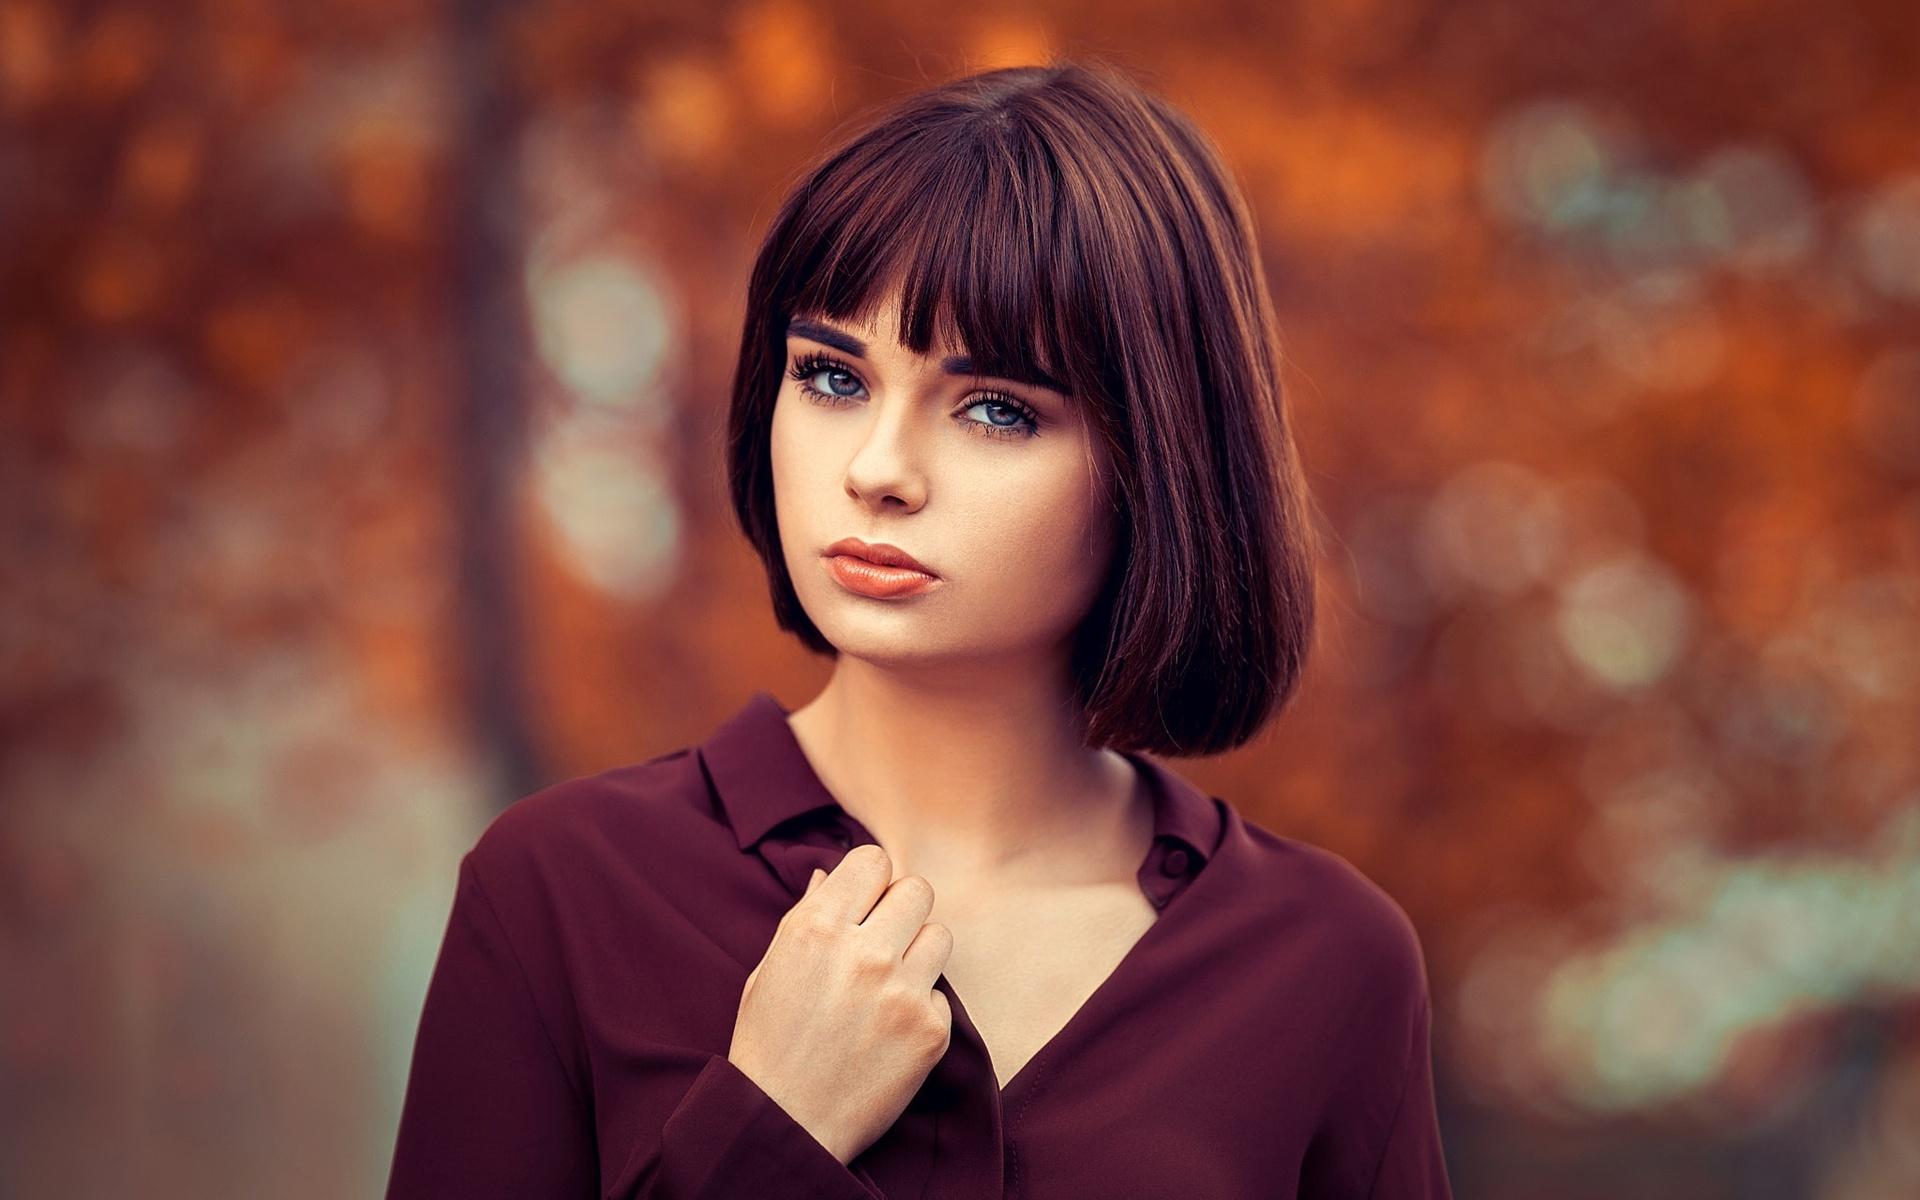 Картинки фото девушка с челкой